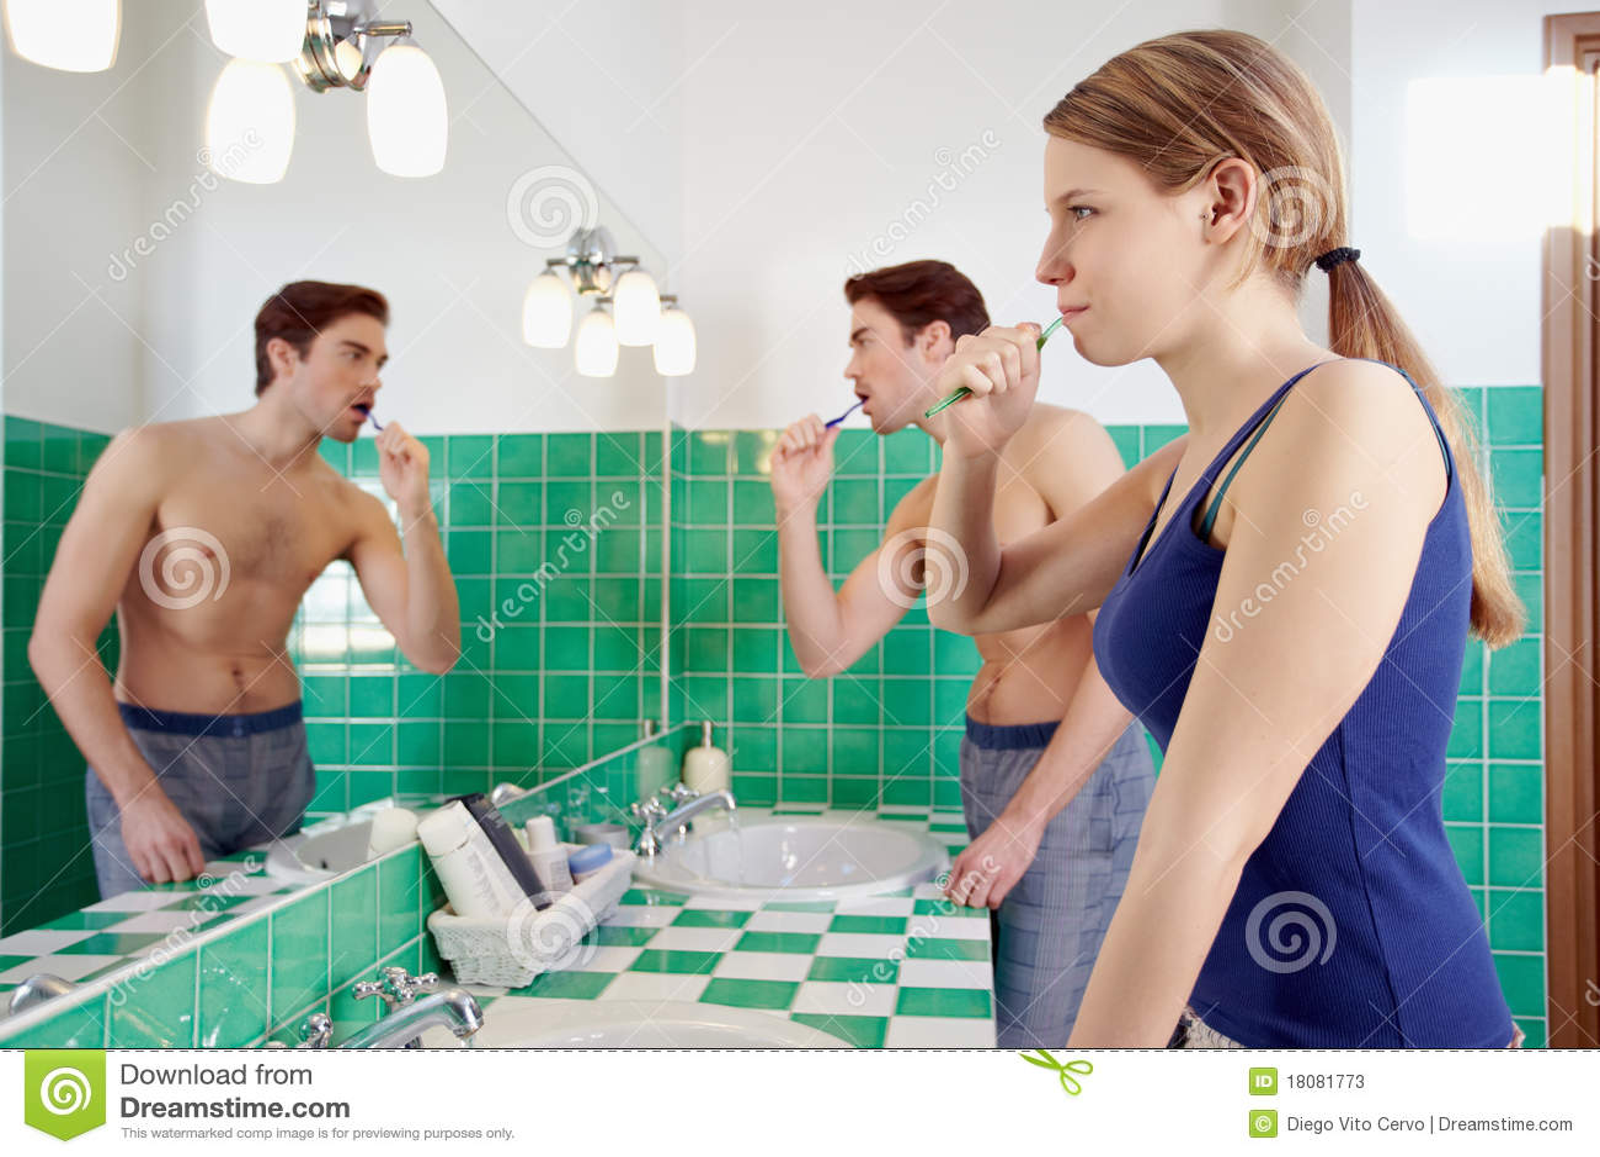 Masturbating and teasing smoking cindy